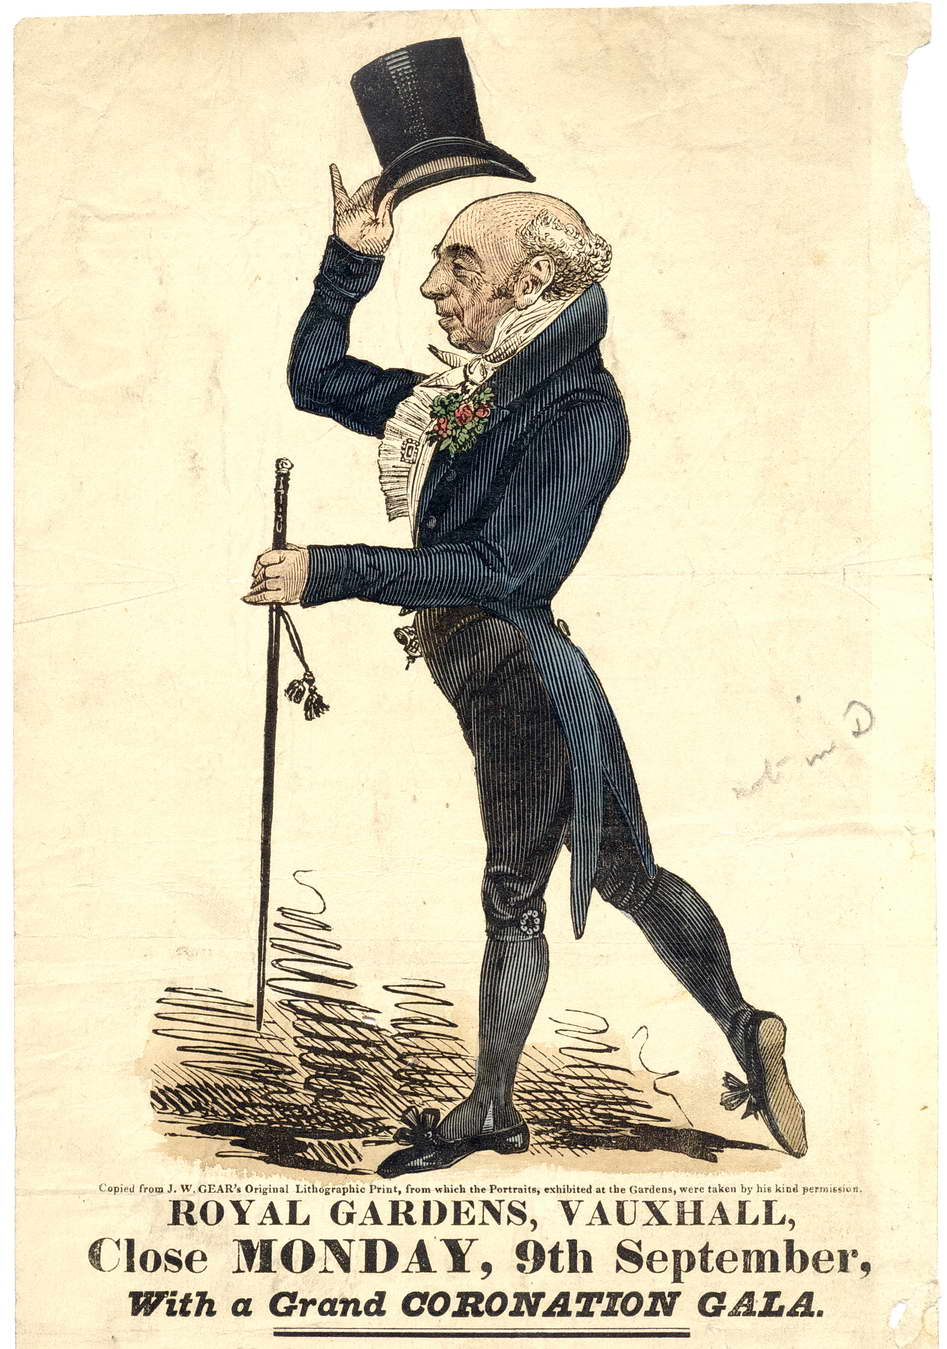 C. H. Simpson, MC of Vauxhall Gardens 1833